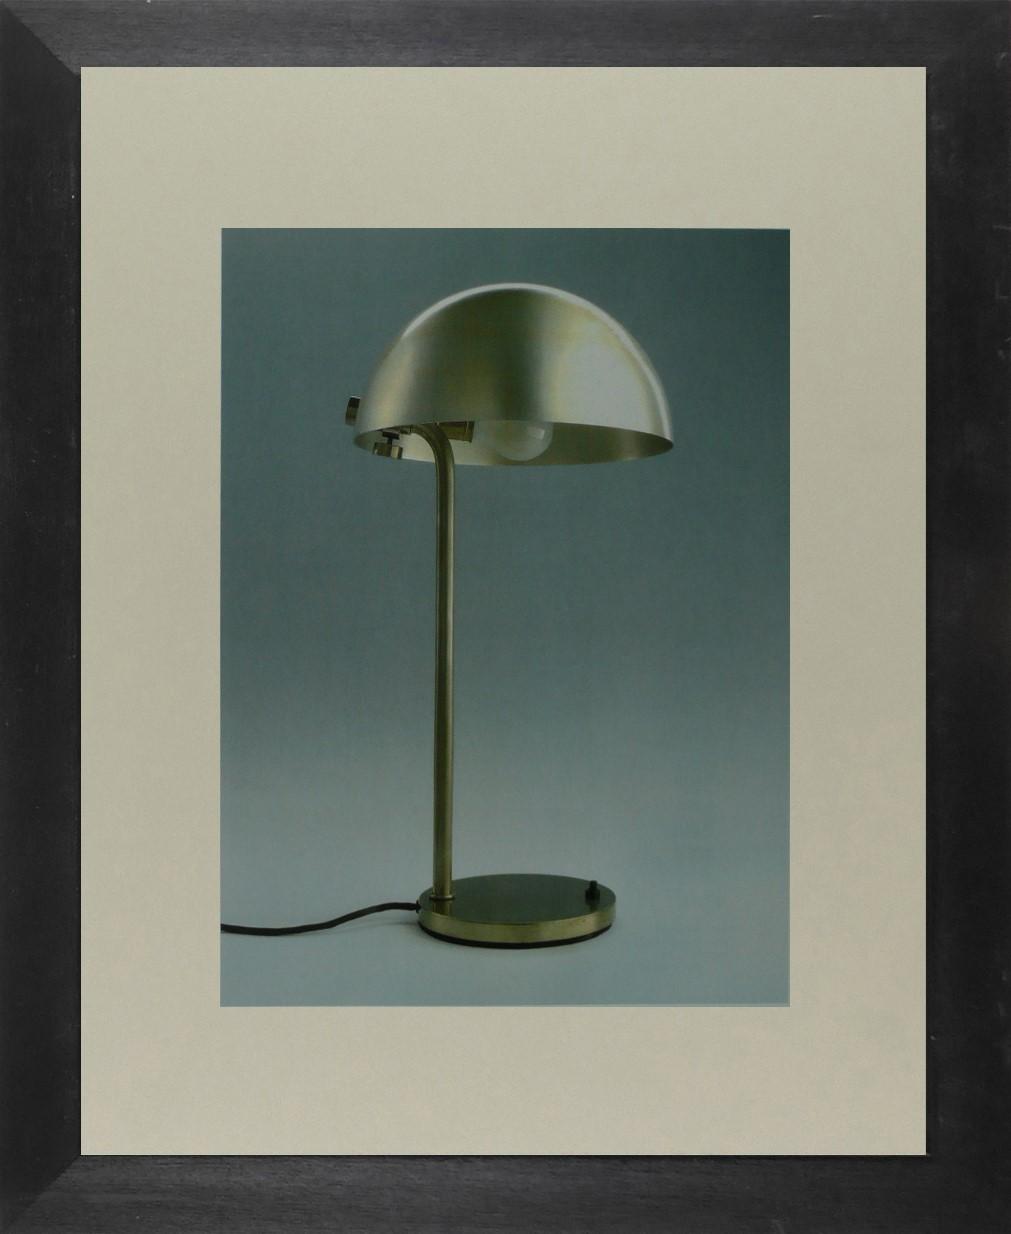 Marianne Brandt - Metallic table lamp (Bauhaus) - Framed Picture 11 x 14